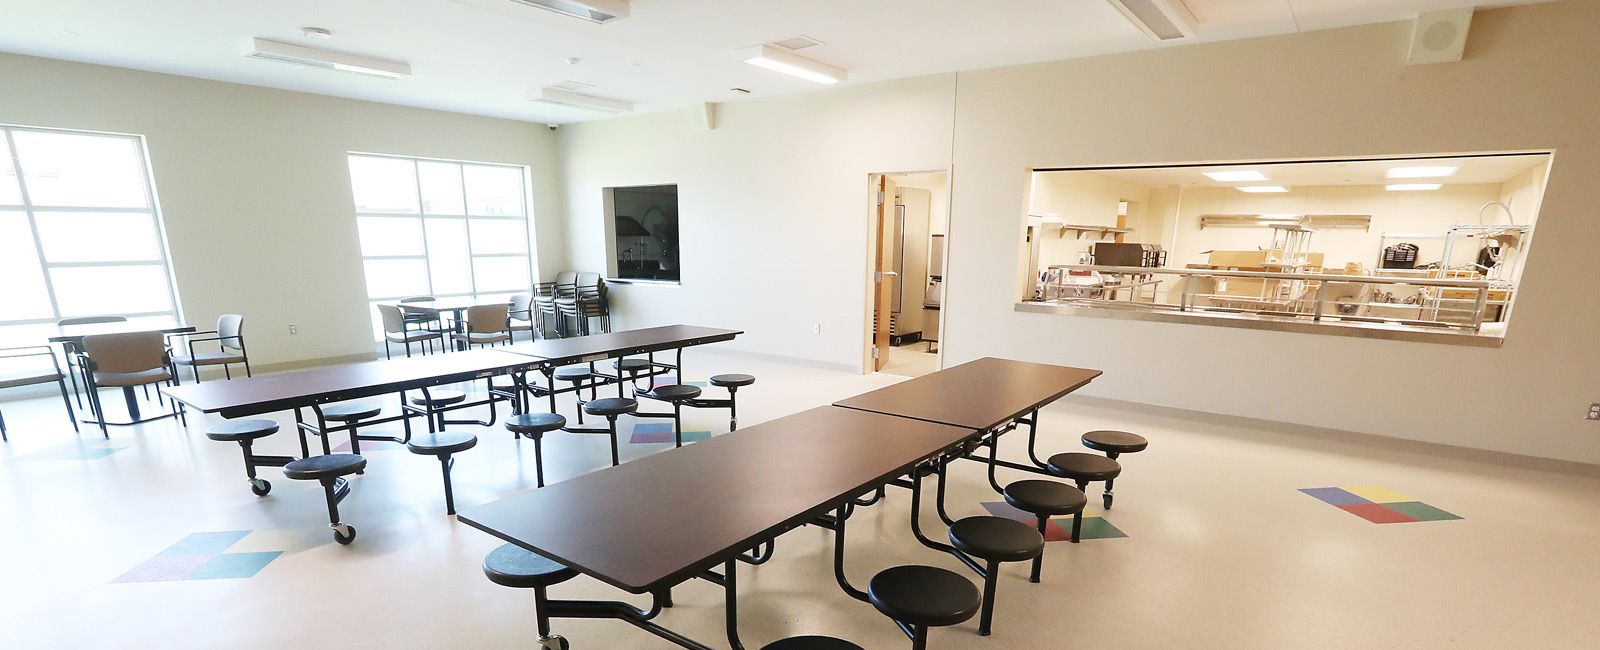 Eagle View Behavioral Health Facility Cafeteria